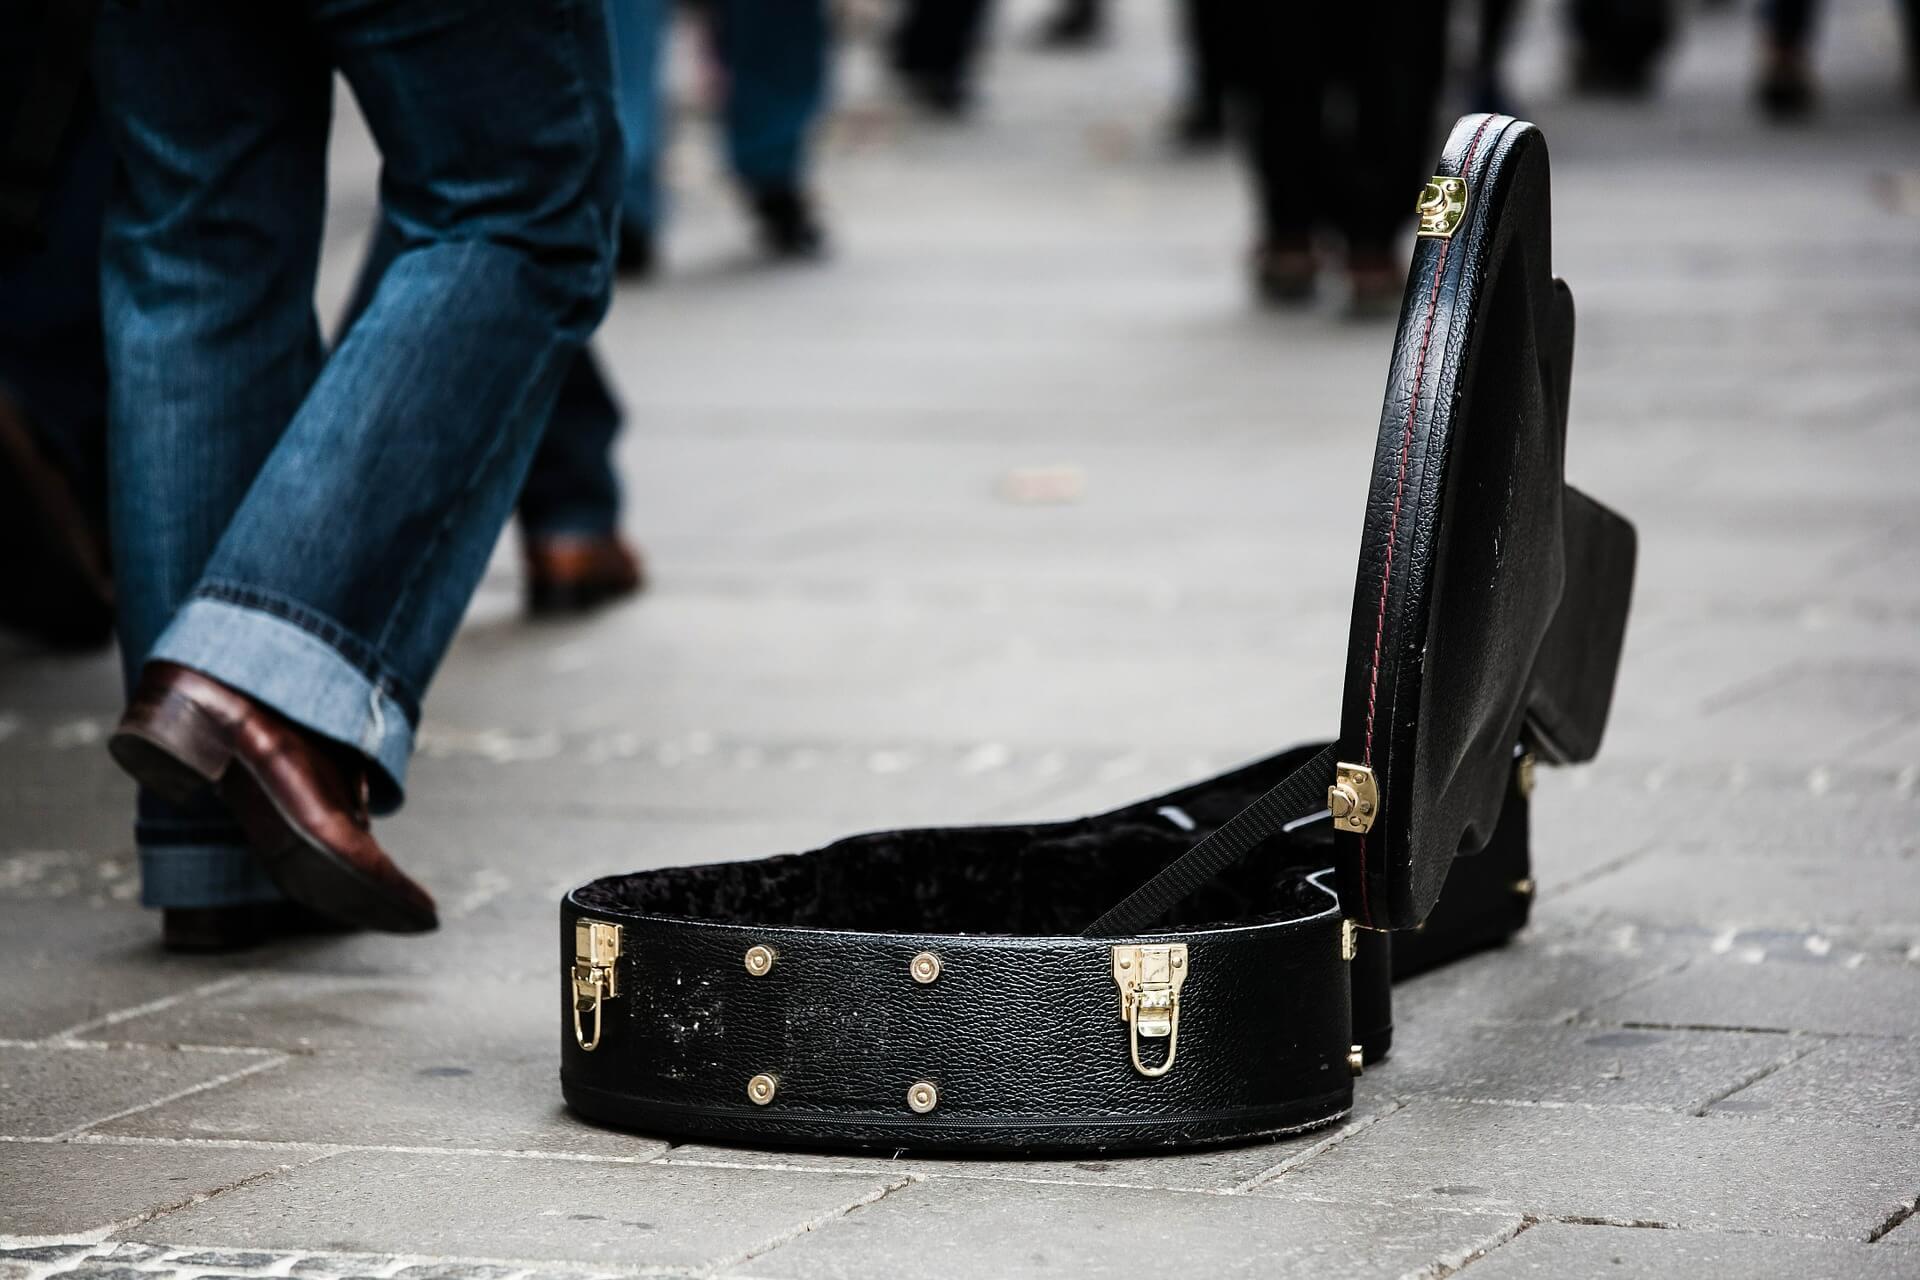 Straßenmusik: Gitarre vs. Piccolo-Flöte